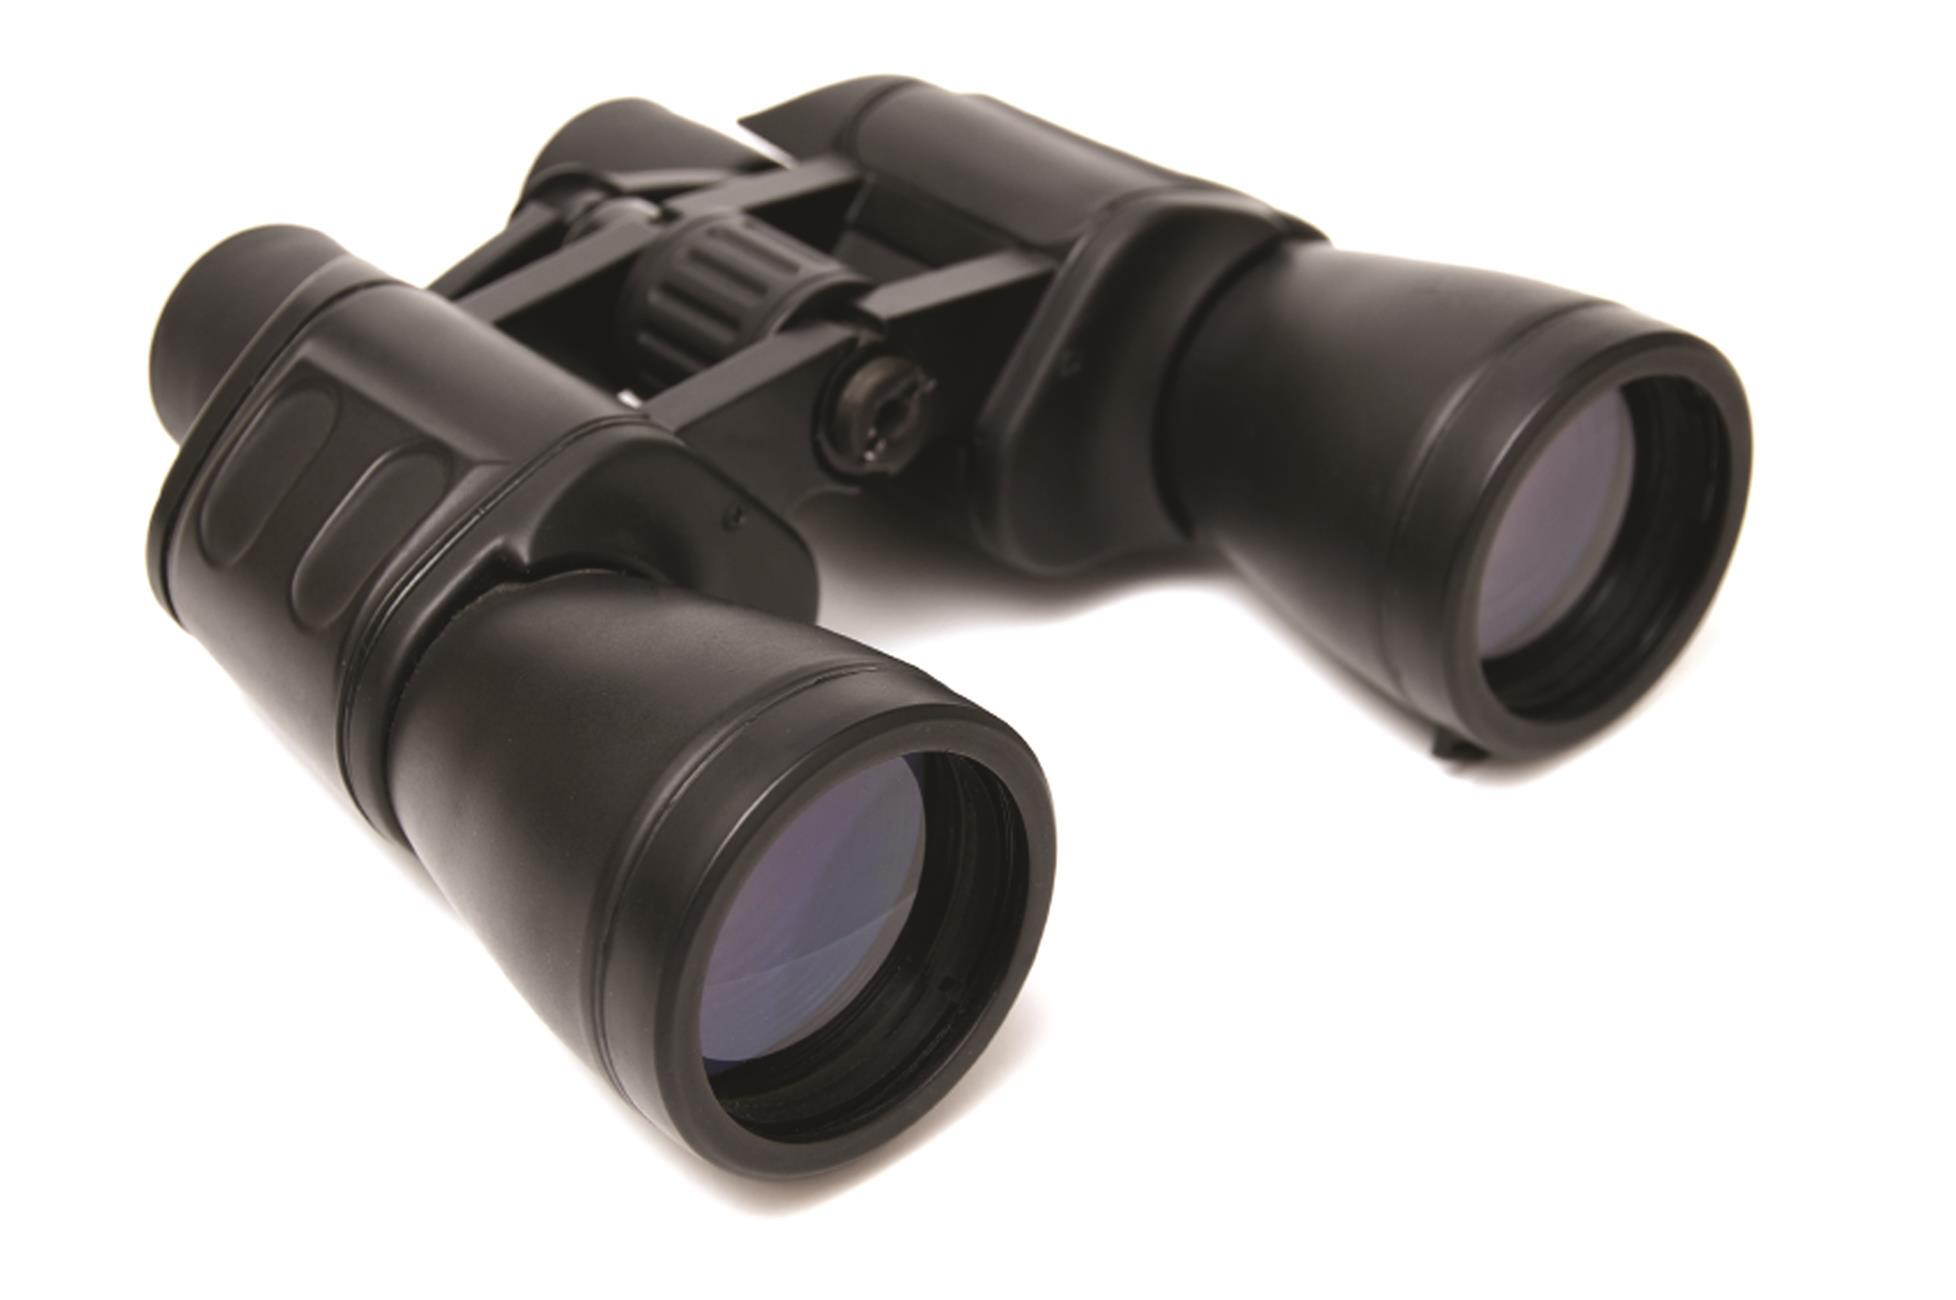 Binoculars image